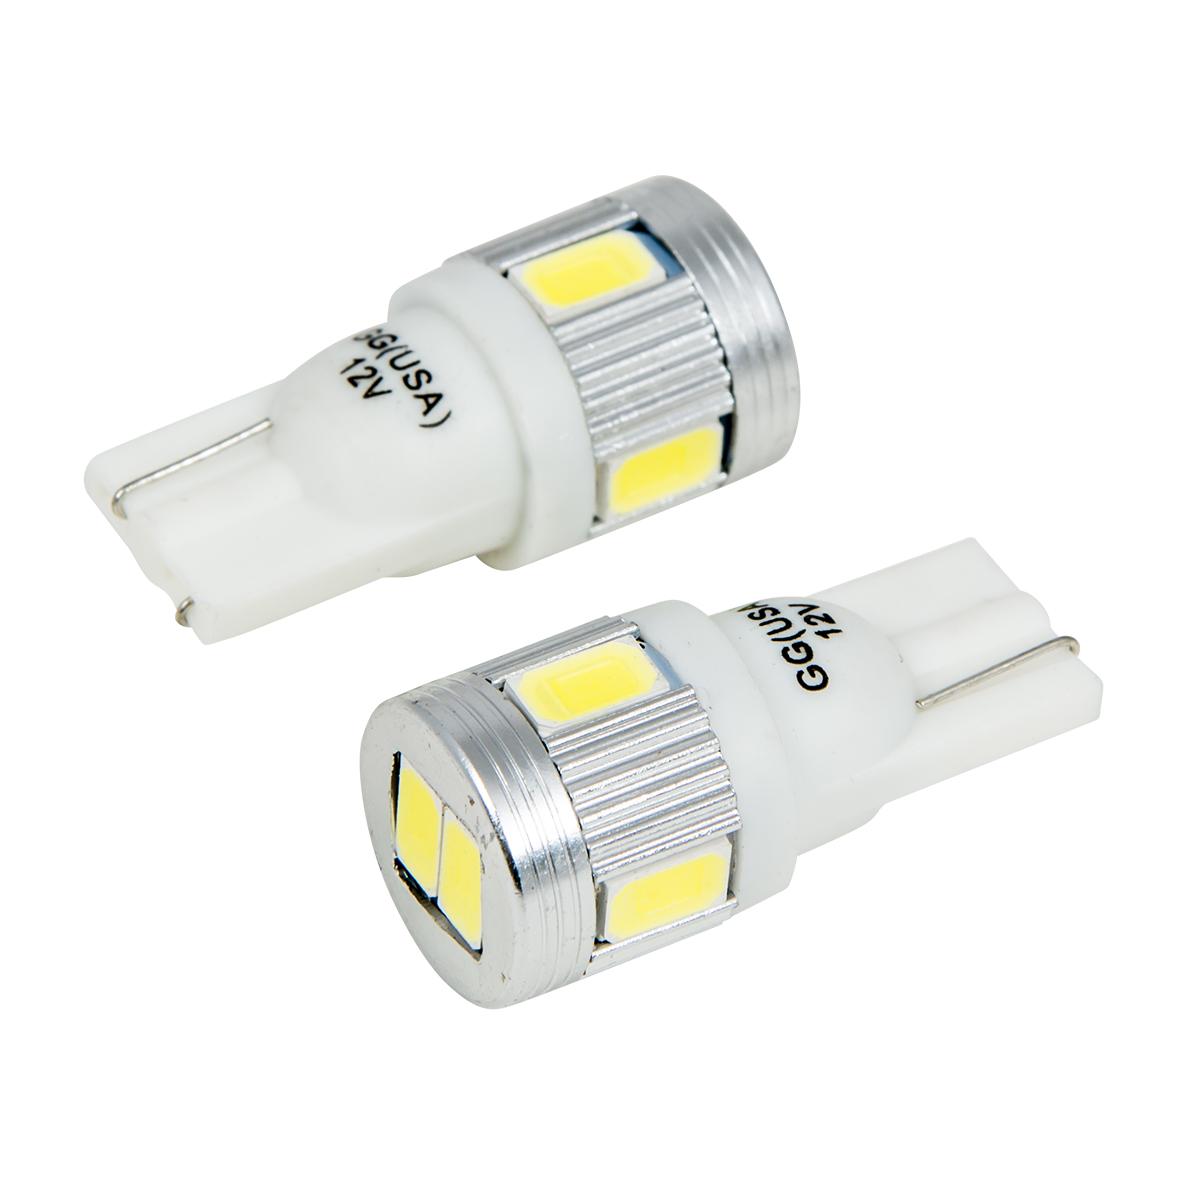 70604 194/168 Tower Style 6 High Power LED Light Bulb